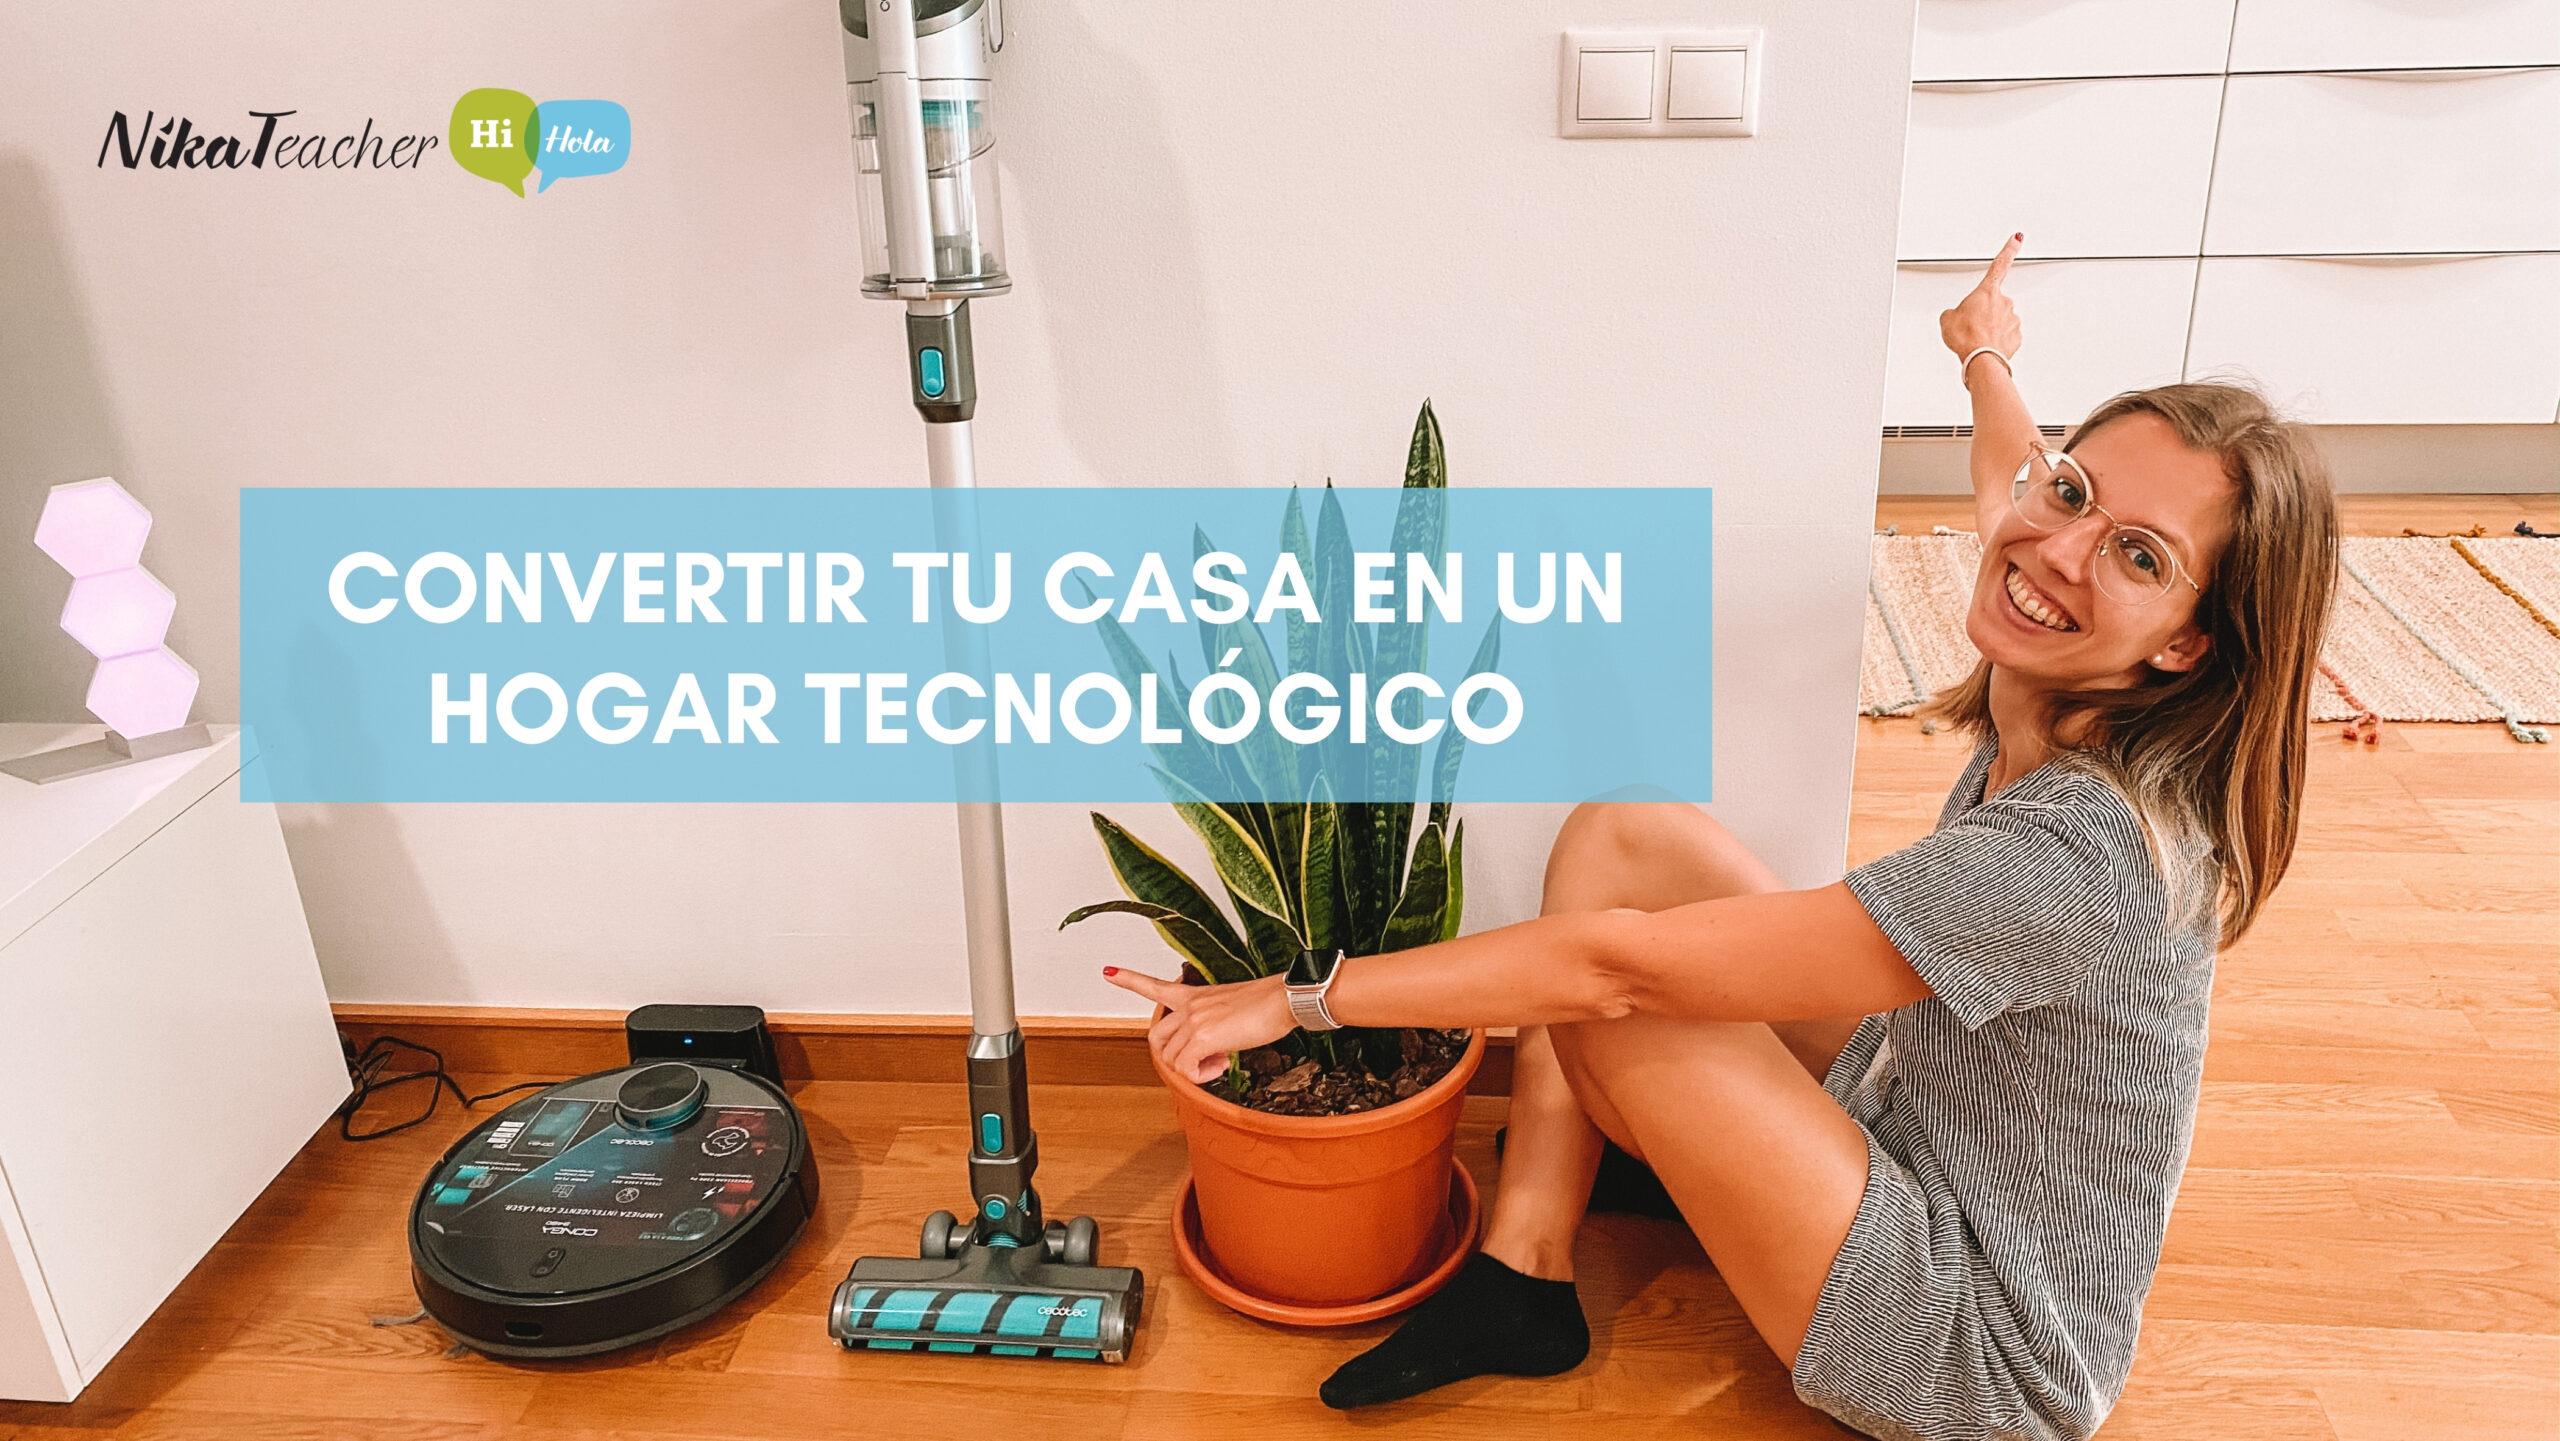 Convertir tu casa en un hogar tecnológico